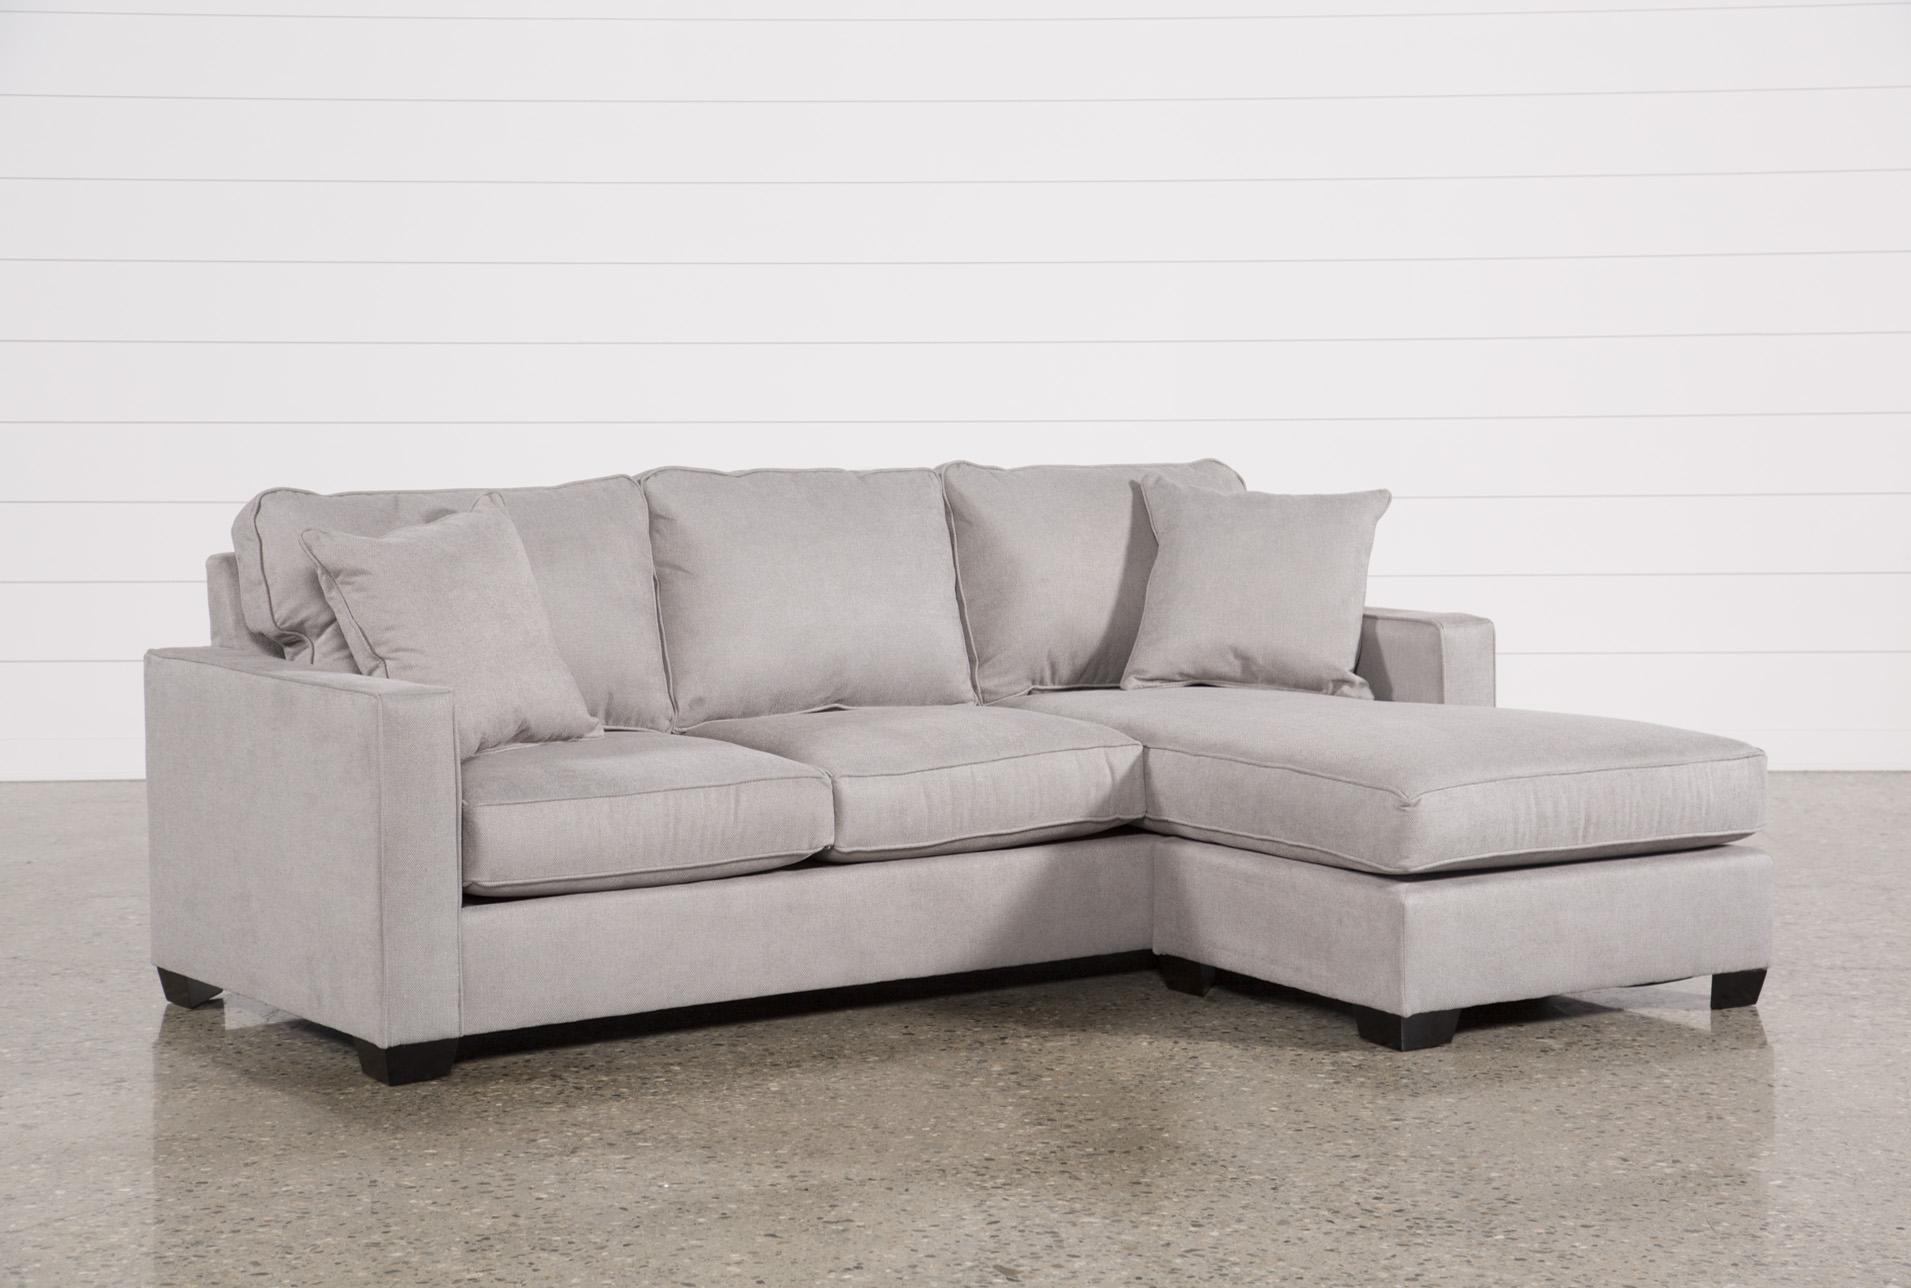 Egan II Cement Sofa W/Reversible Chaise   360